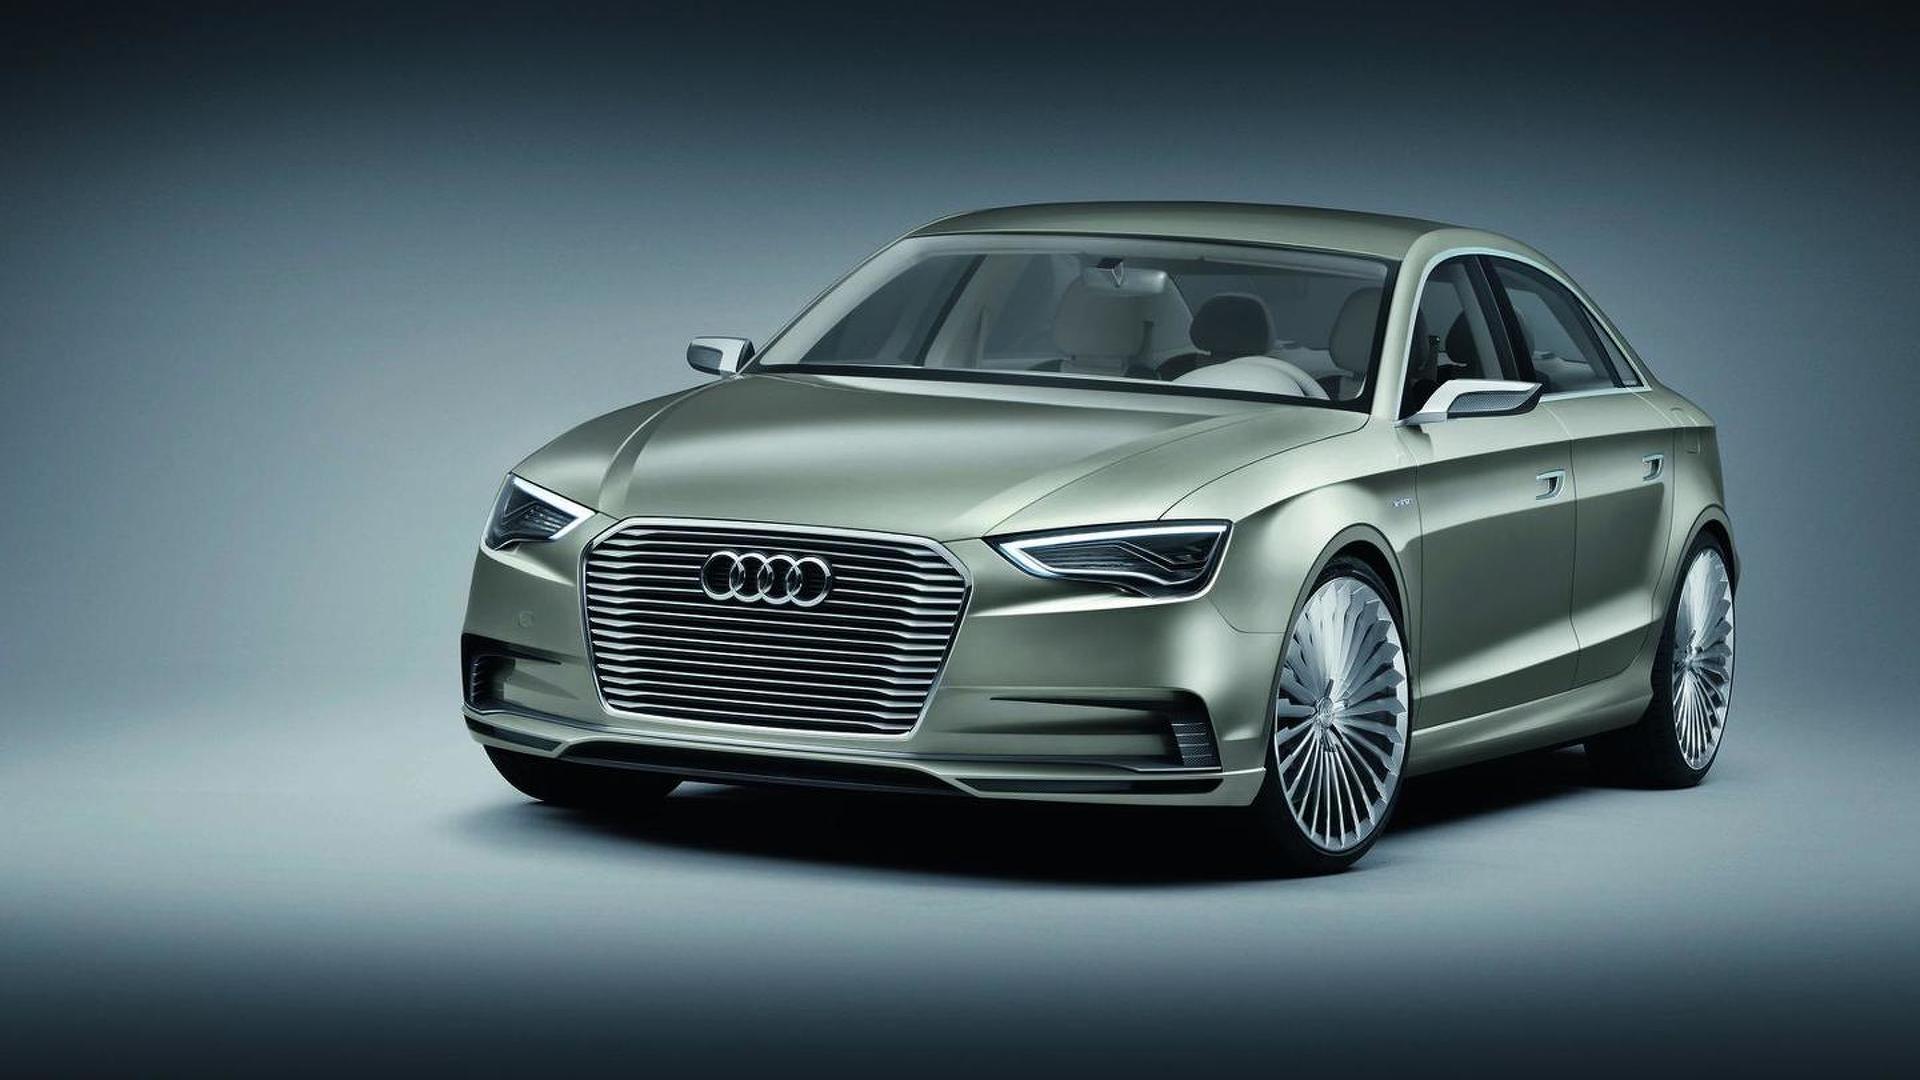 Kelebihan Audi S3 2012 Review